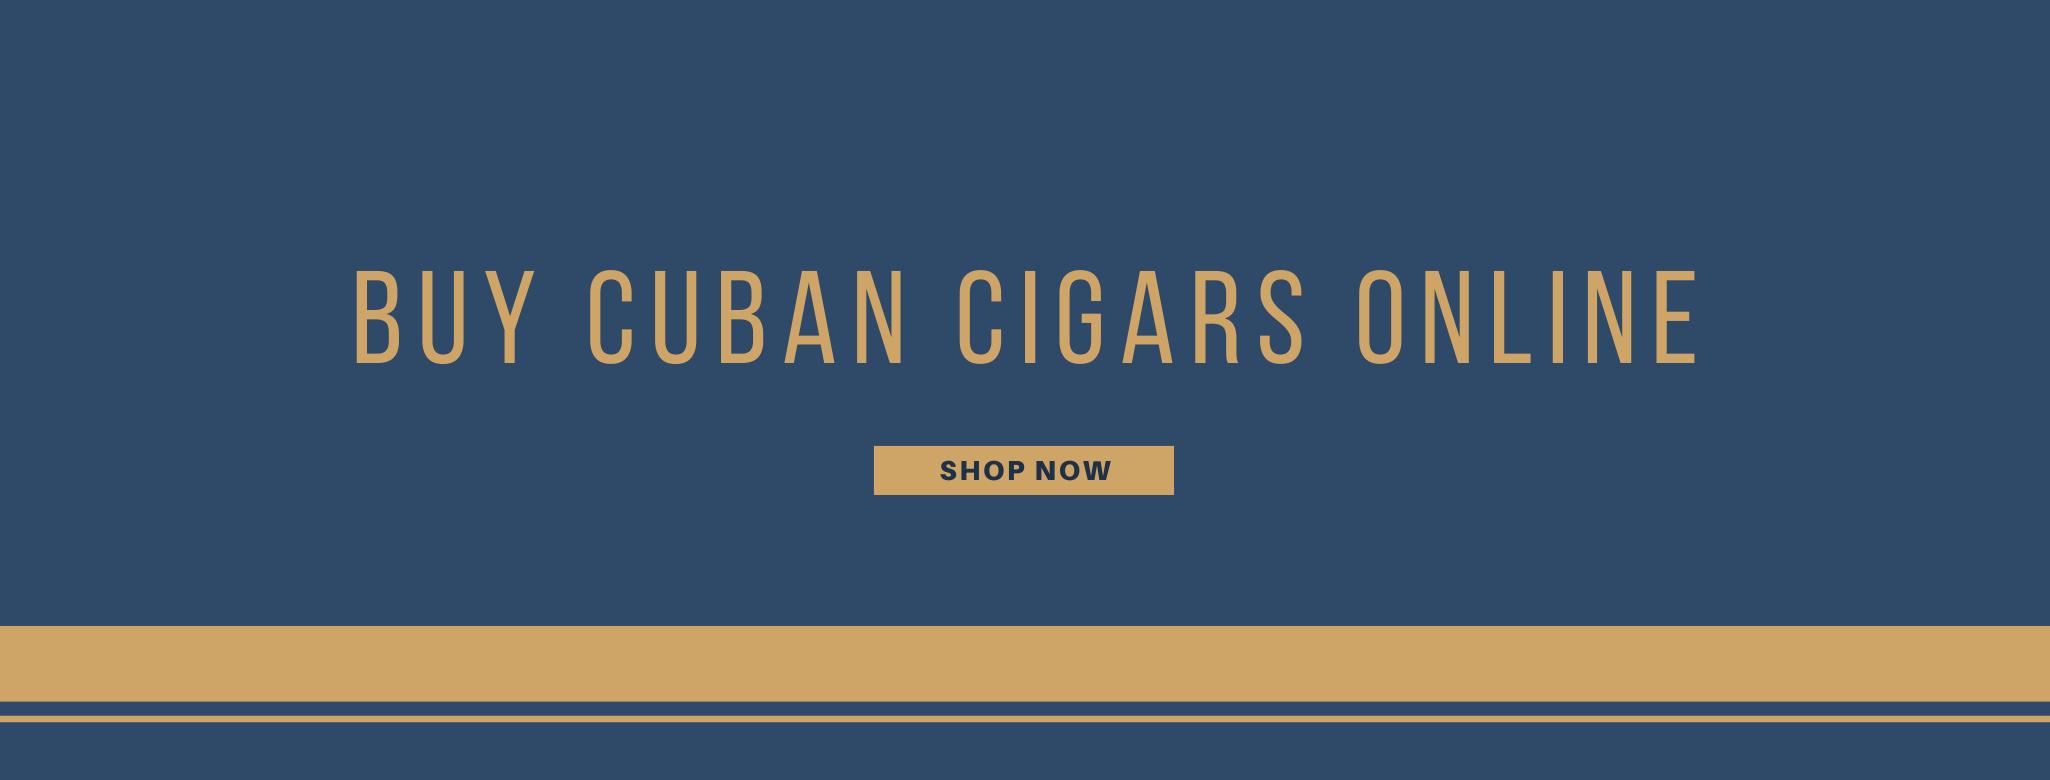 Buy Cuban cigars online banner